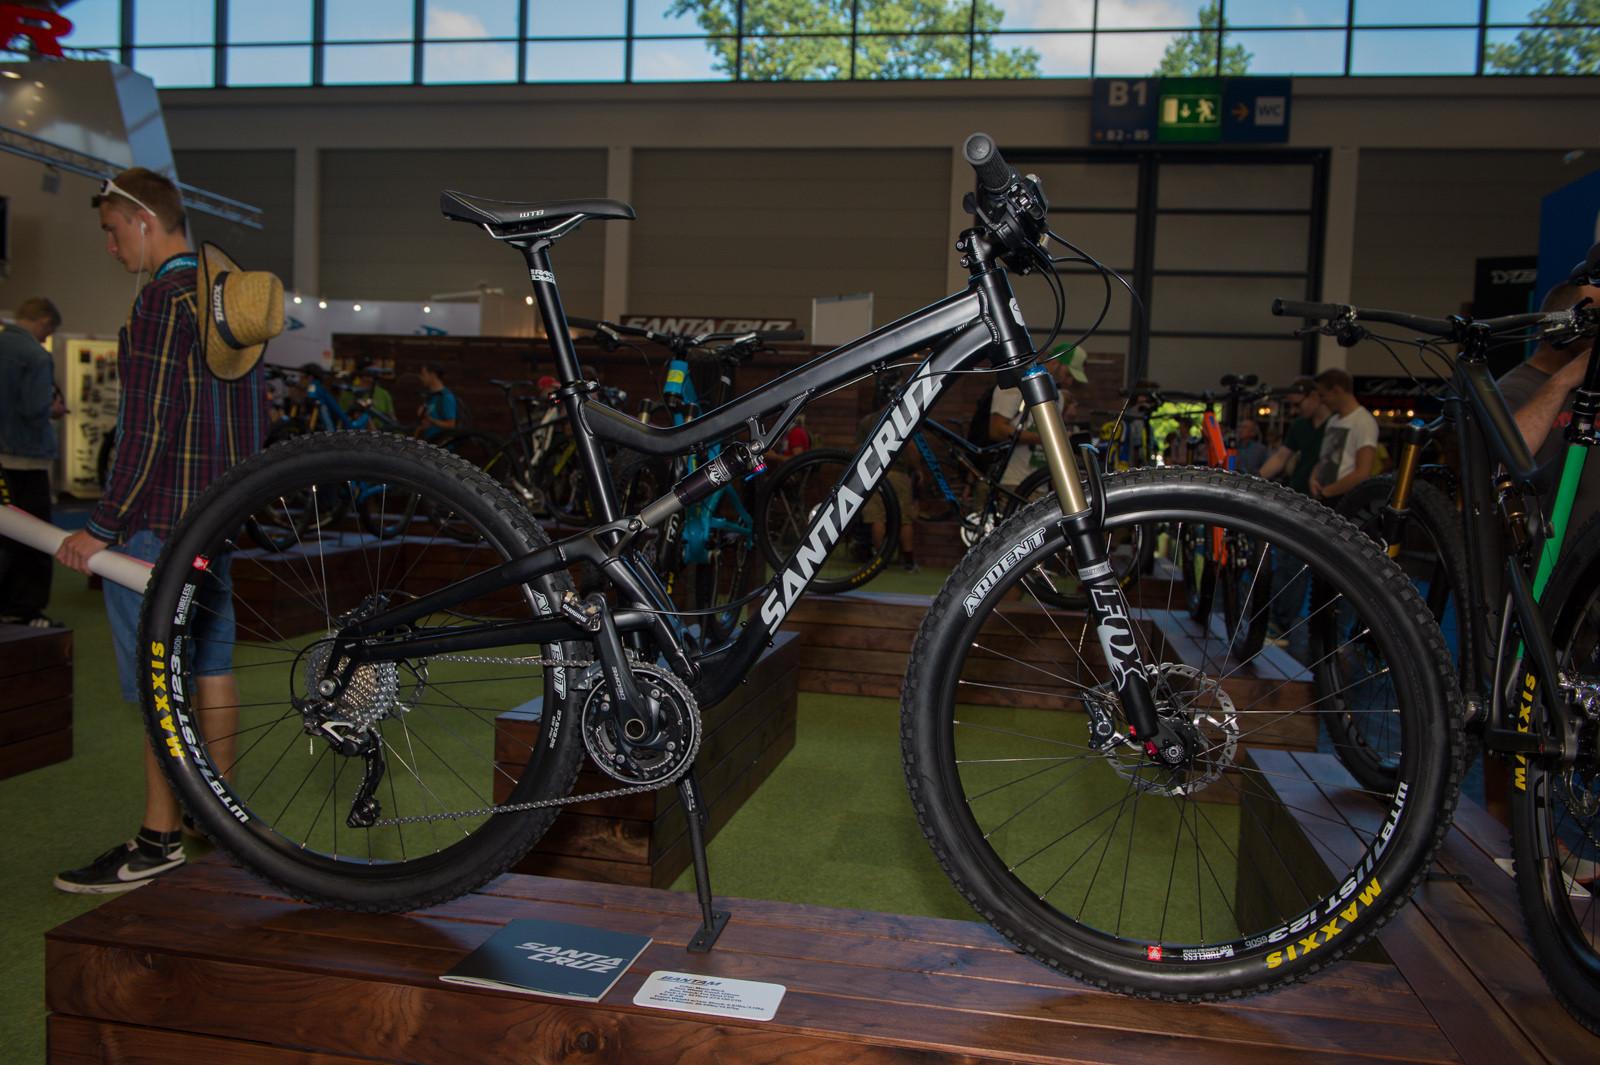 2014 Santa Cruz Bantam - 2014 Trail, All-Mountain & Enduro Bikes at Eurobike 2013 - Mountain Biking Pictures - Vital MTB